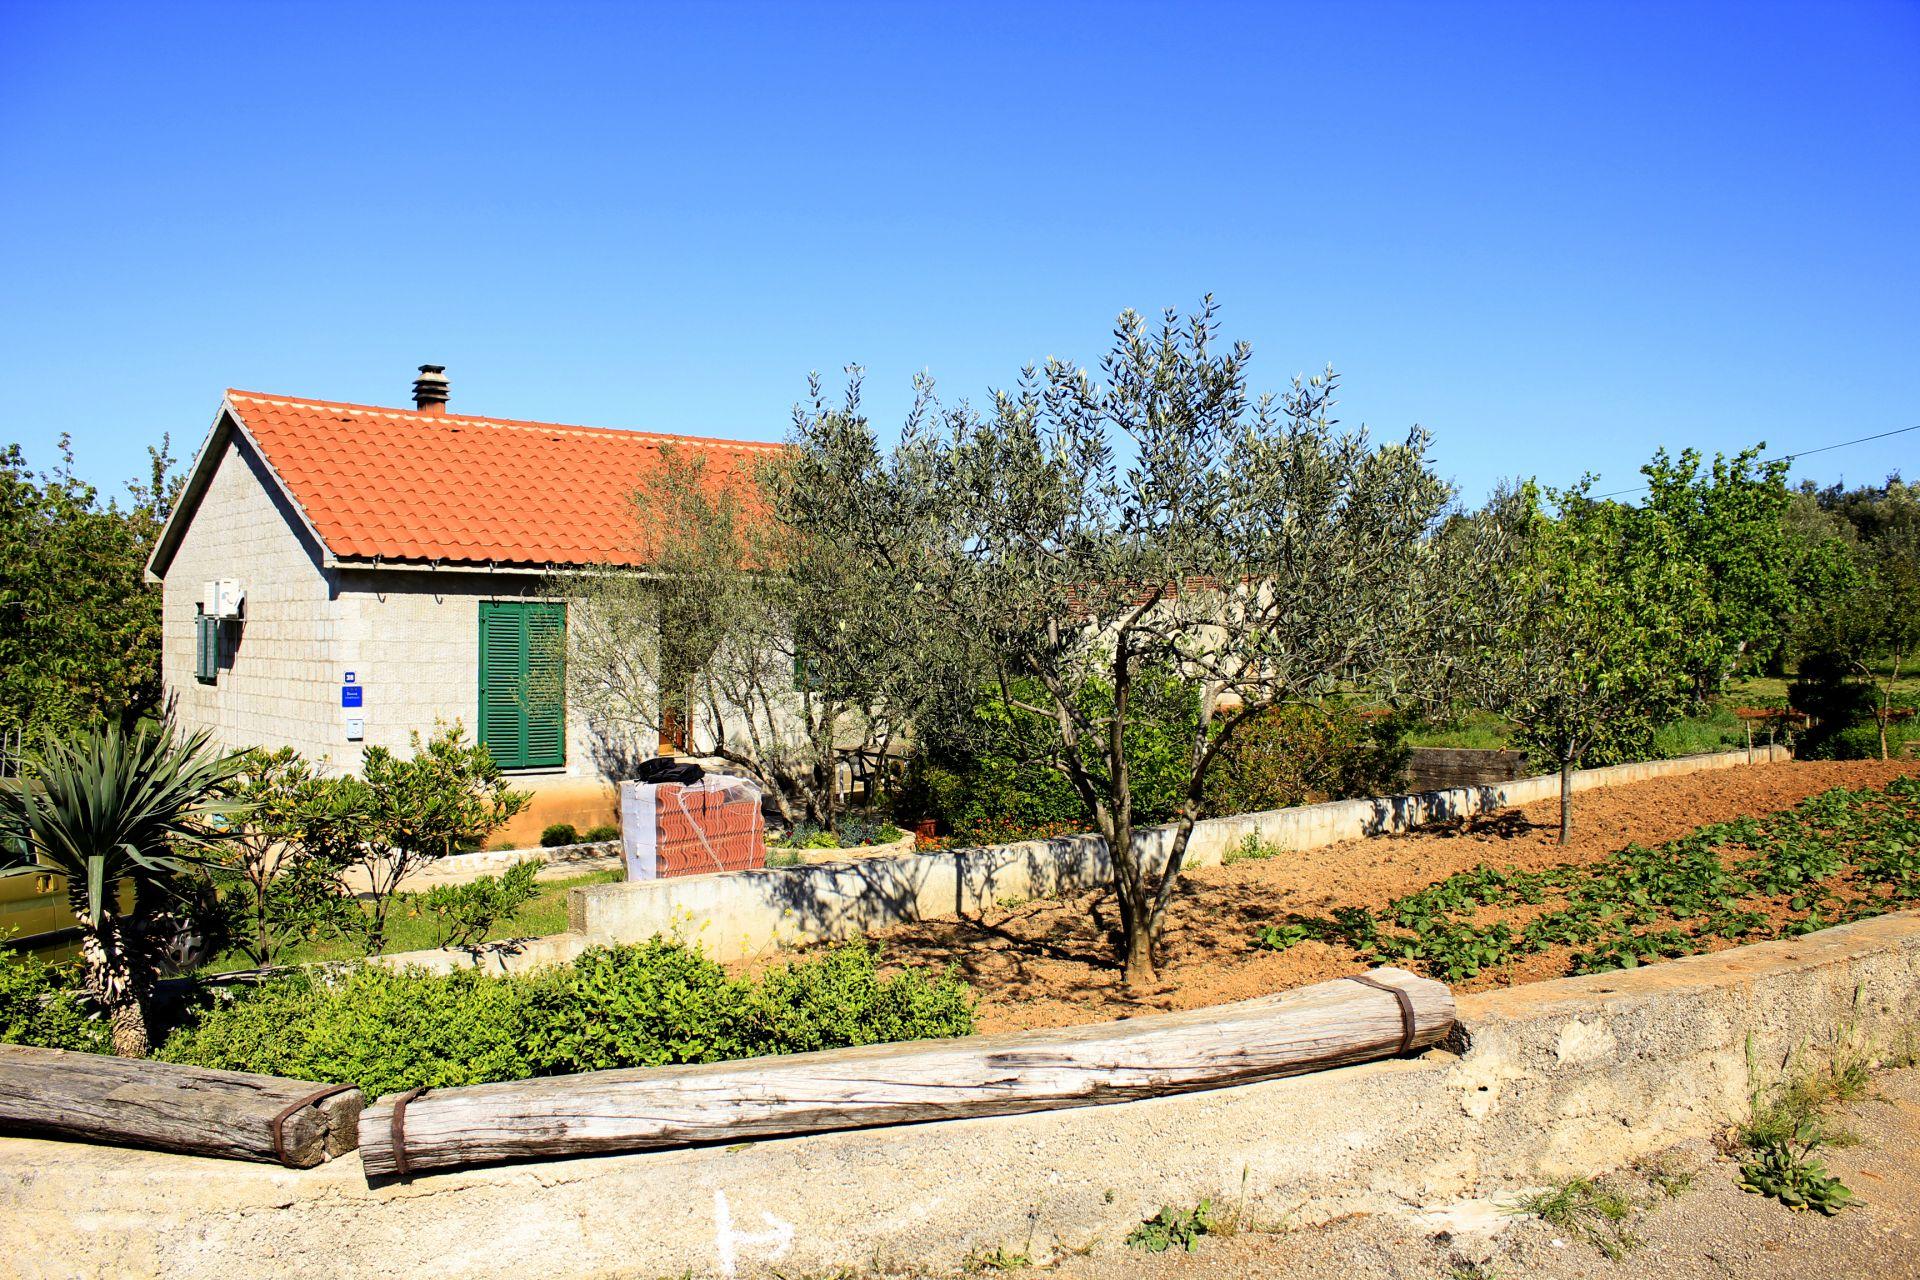 Pavica K - Pasman - Vakantiehuizen, villa´s Kroatië